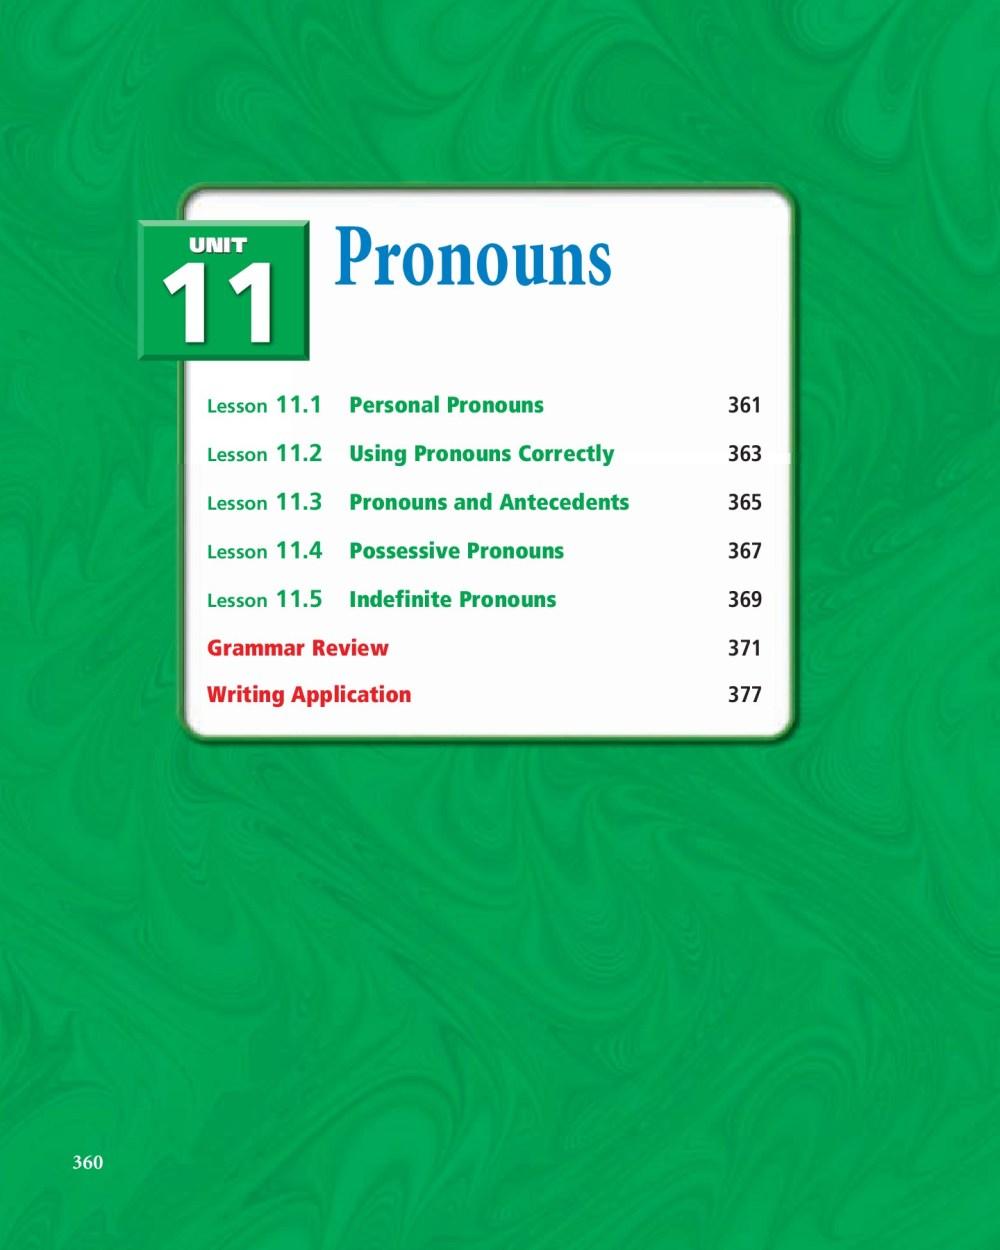 medium resolution of 11 UNIT Pronouns - pc mac-Flip eBook Pages 1 - 18  AnyFlip   AnyFlip